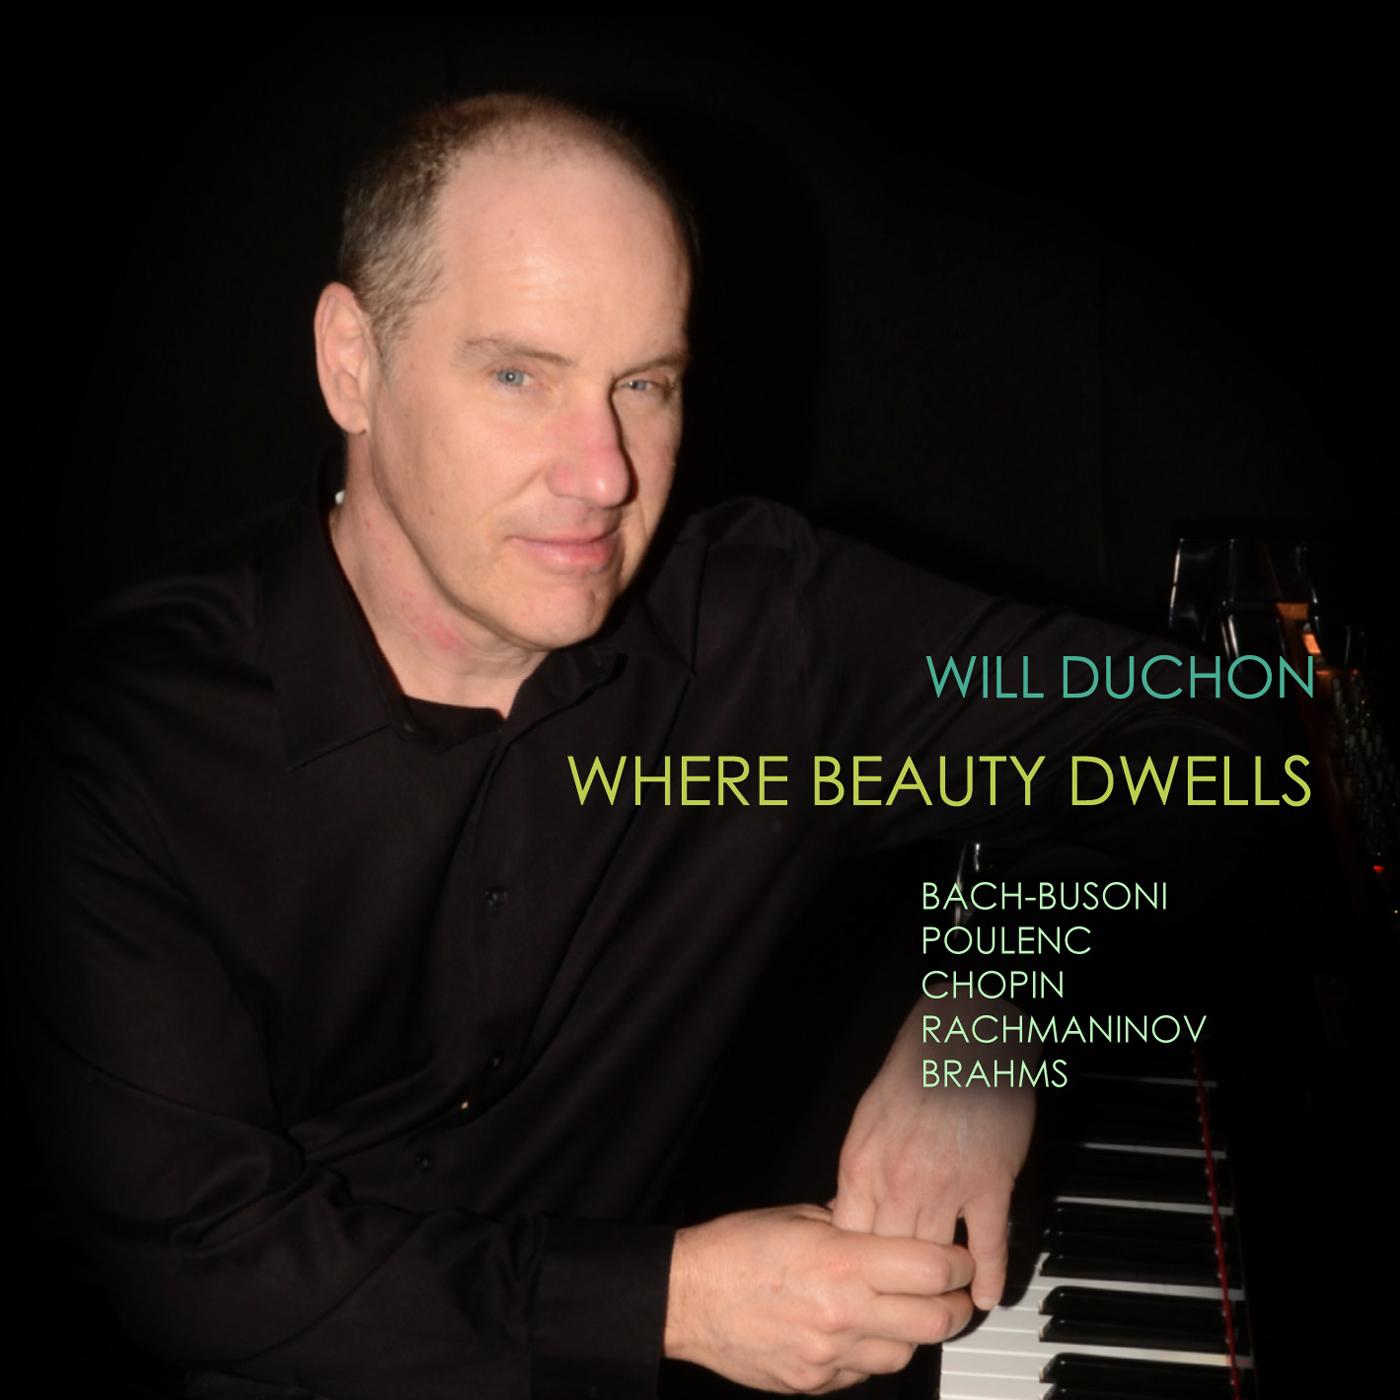 Where Beauty Dwells   Will Duchon